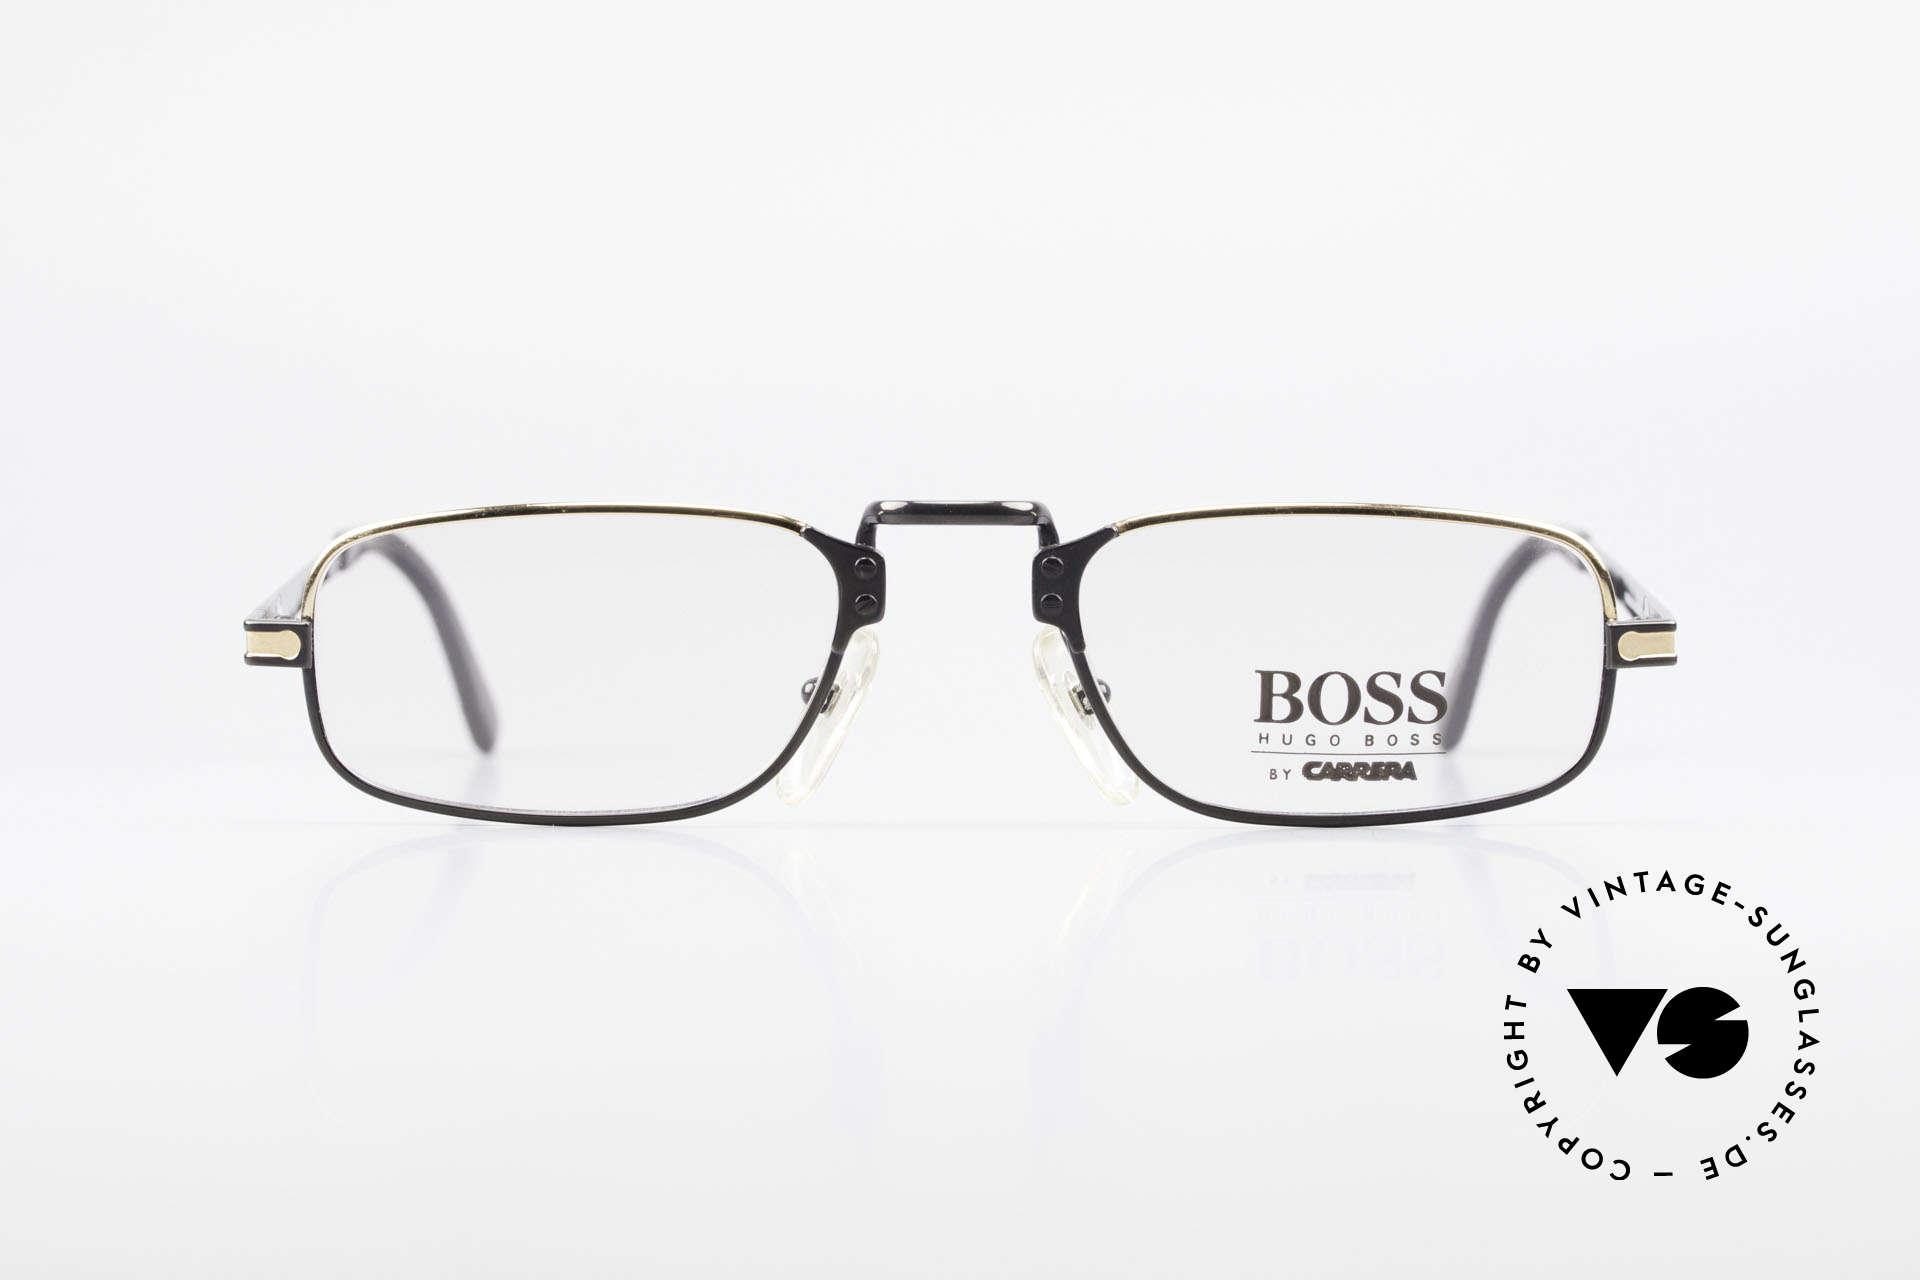 BOSS 5100 Classic Men's Reading Glasses, grand original in premium quality; just timeless!, Made for Men